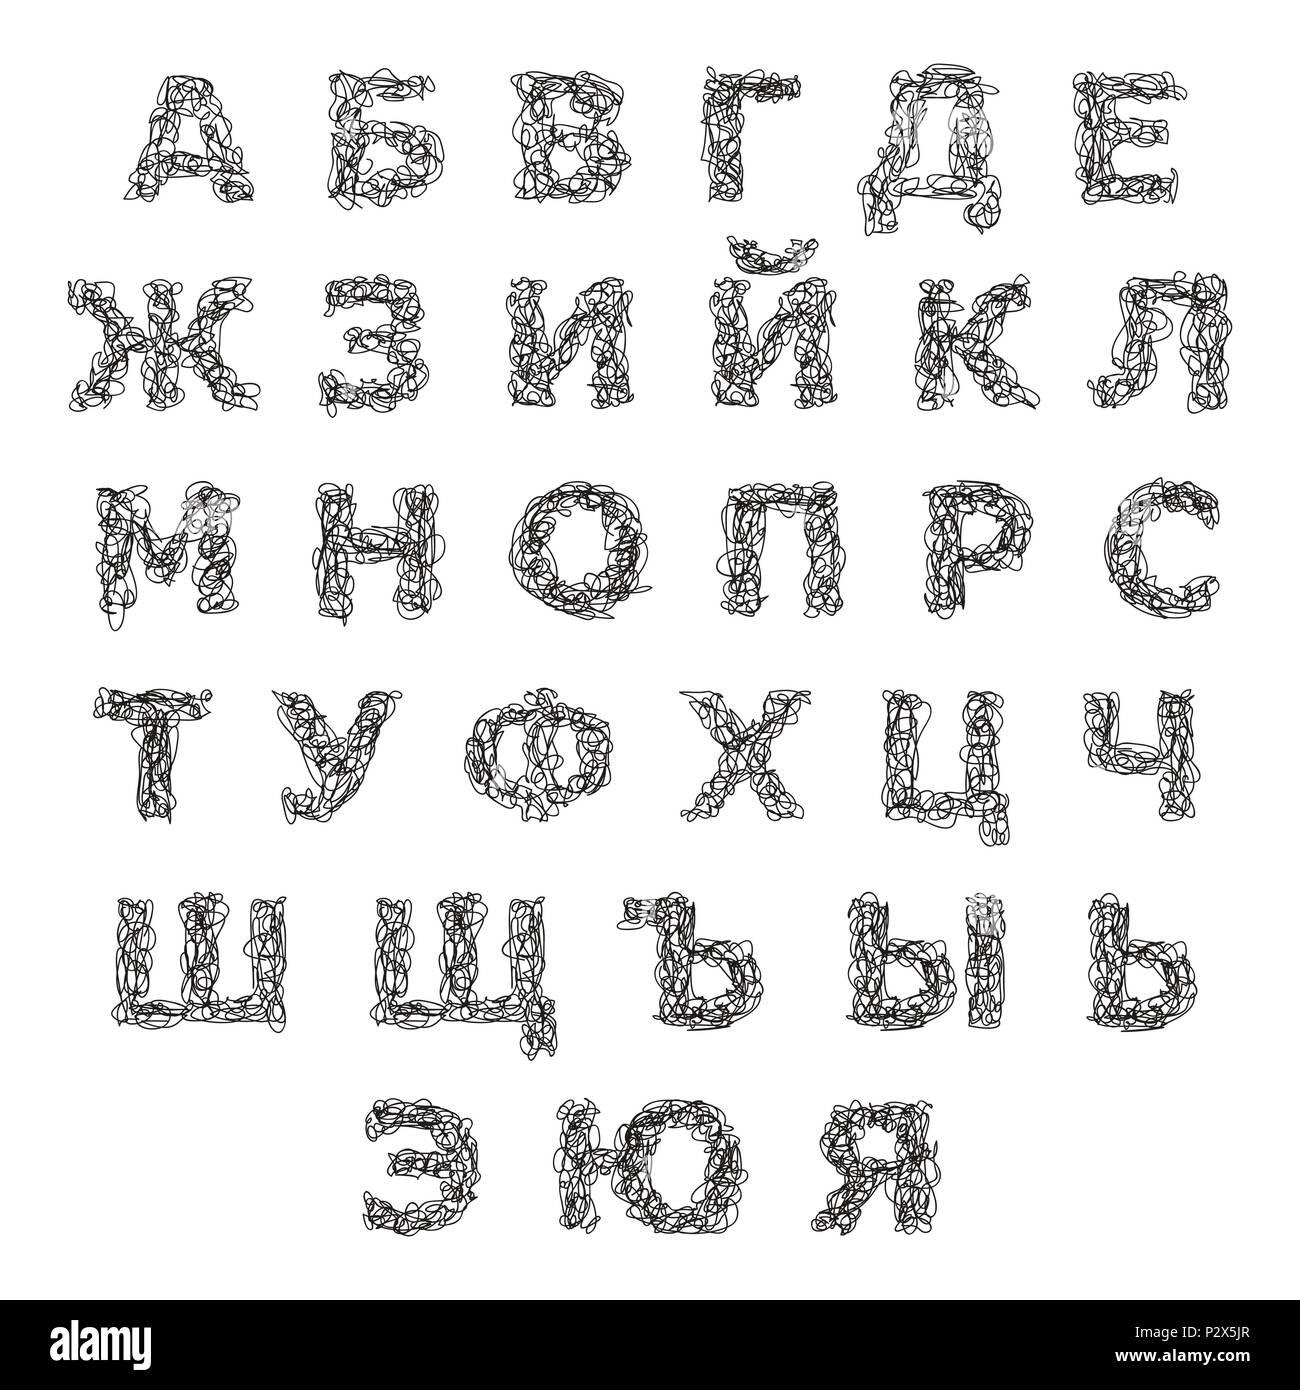 Vector Hand Drawn Doodle Cyrillic Alphabet Eps 10 Stock Vector Art